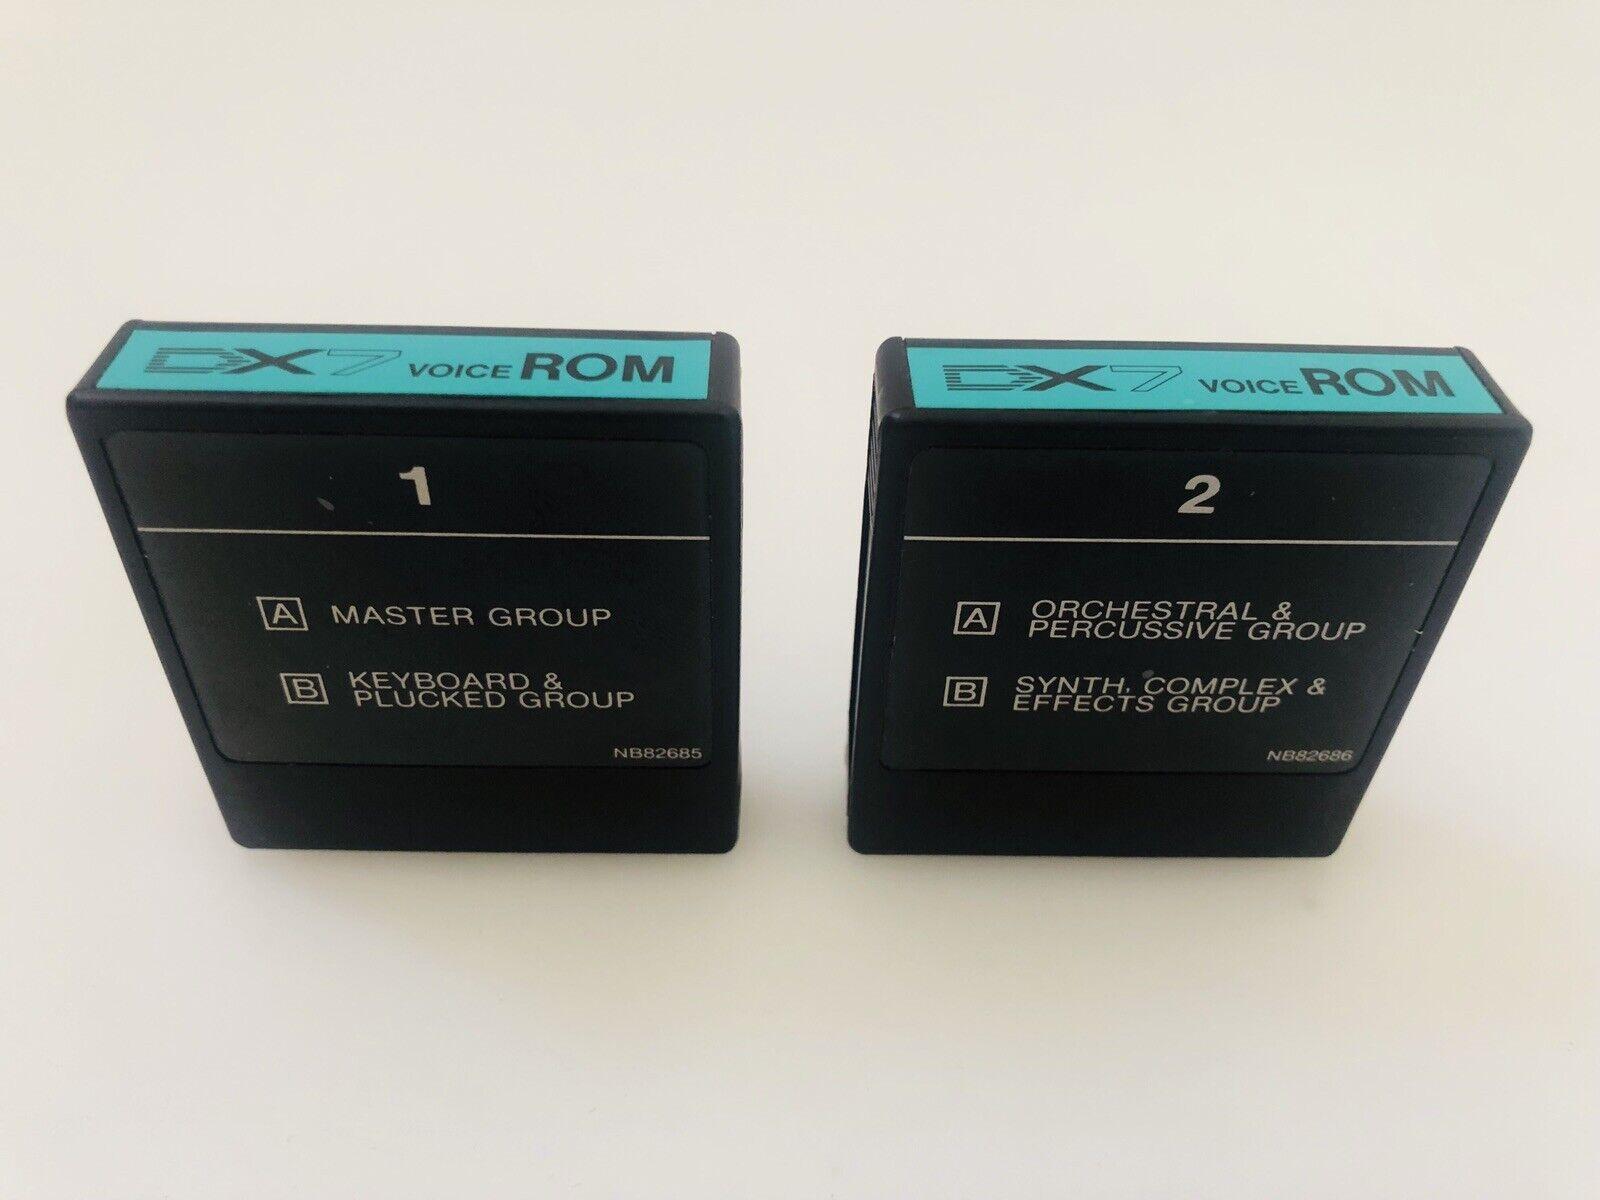 Yamaha DX7 Voice Rom Cartridge 1 & 2